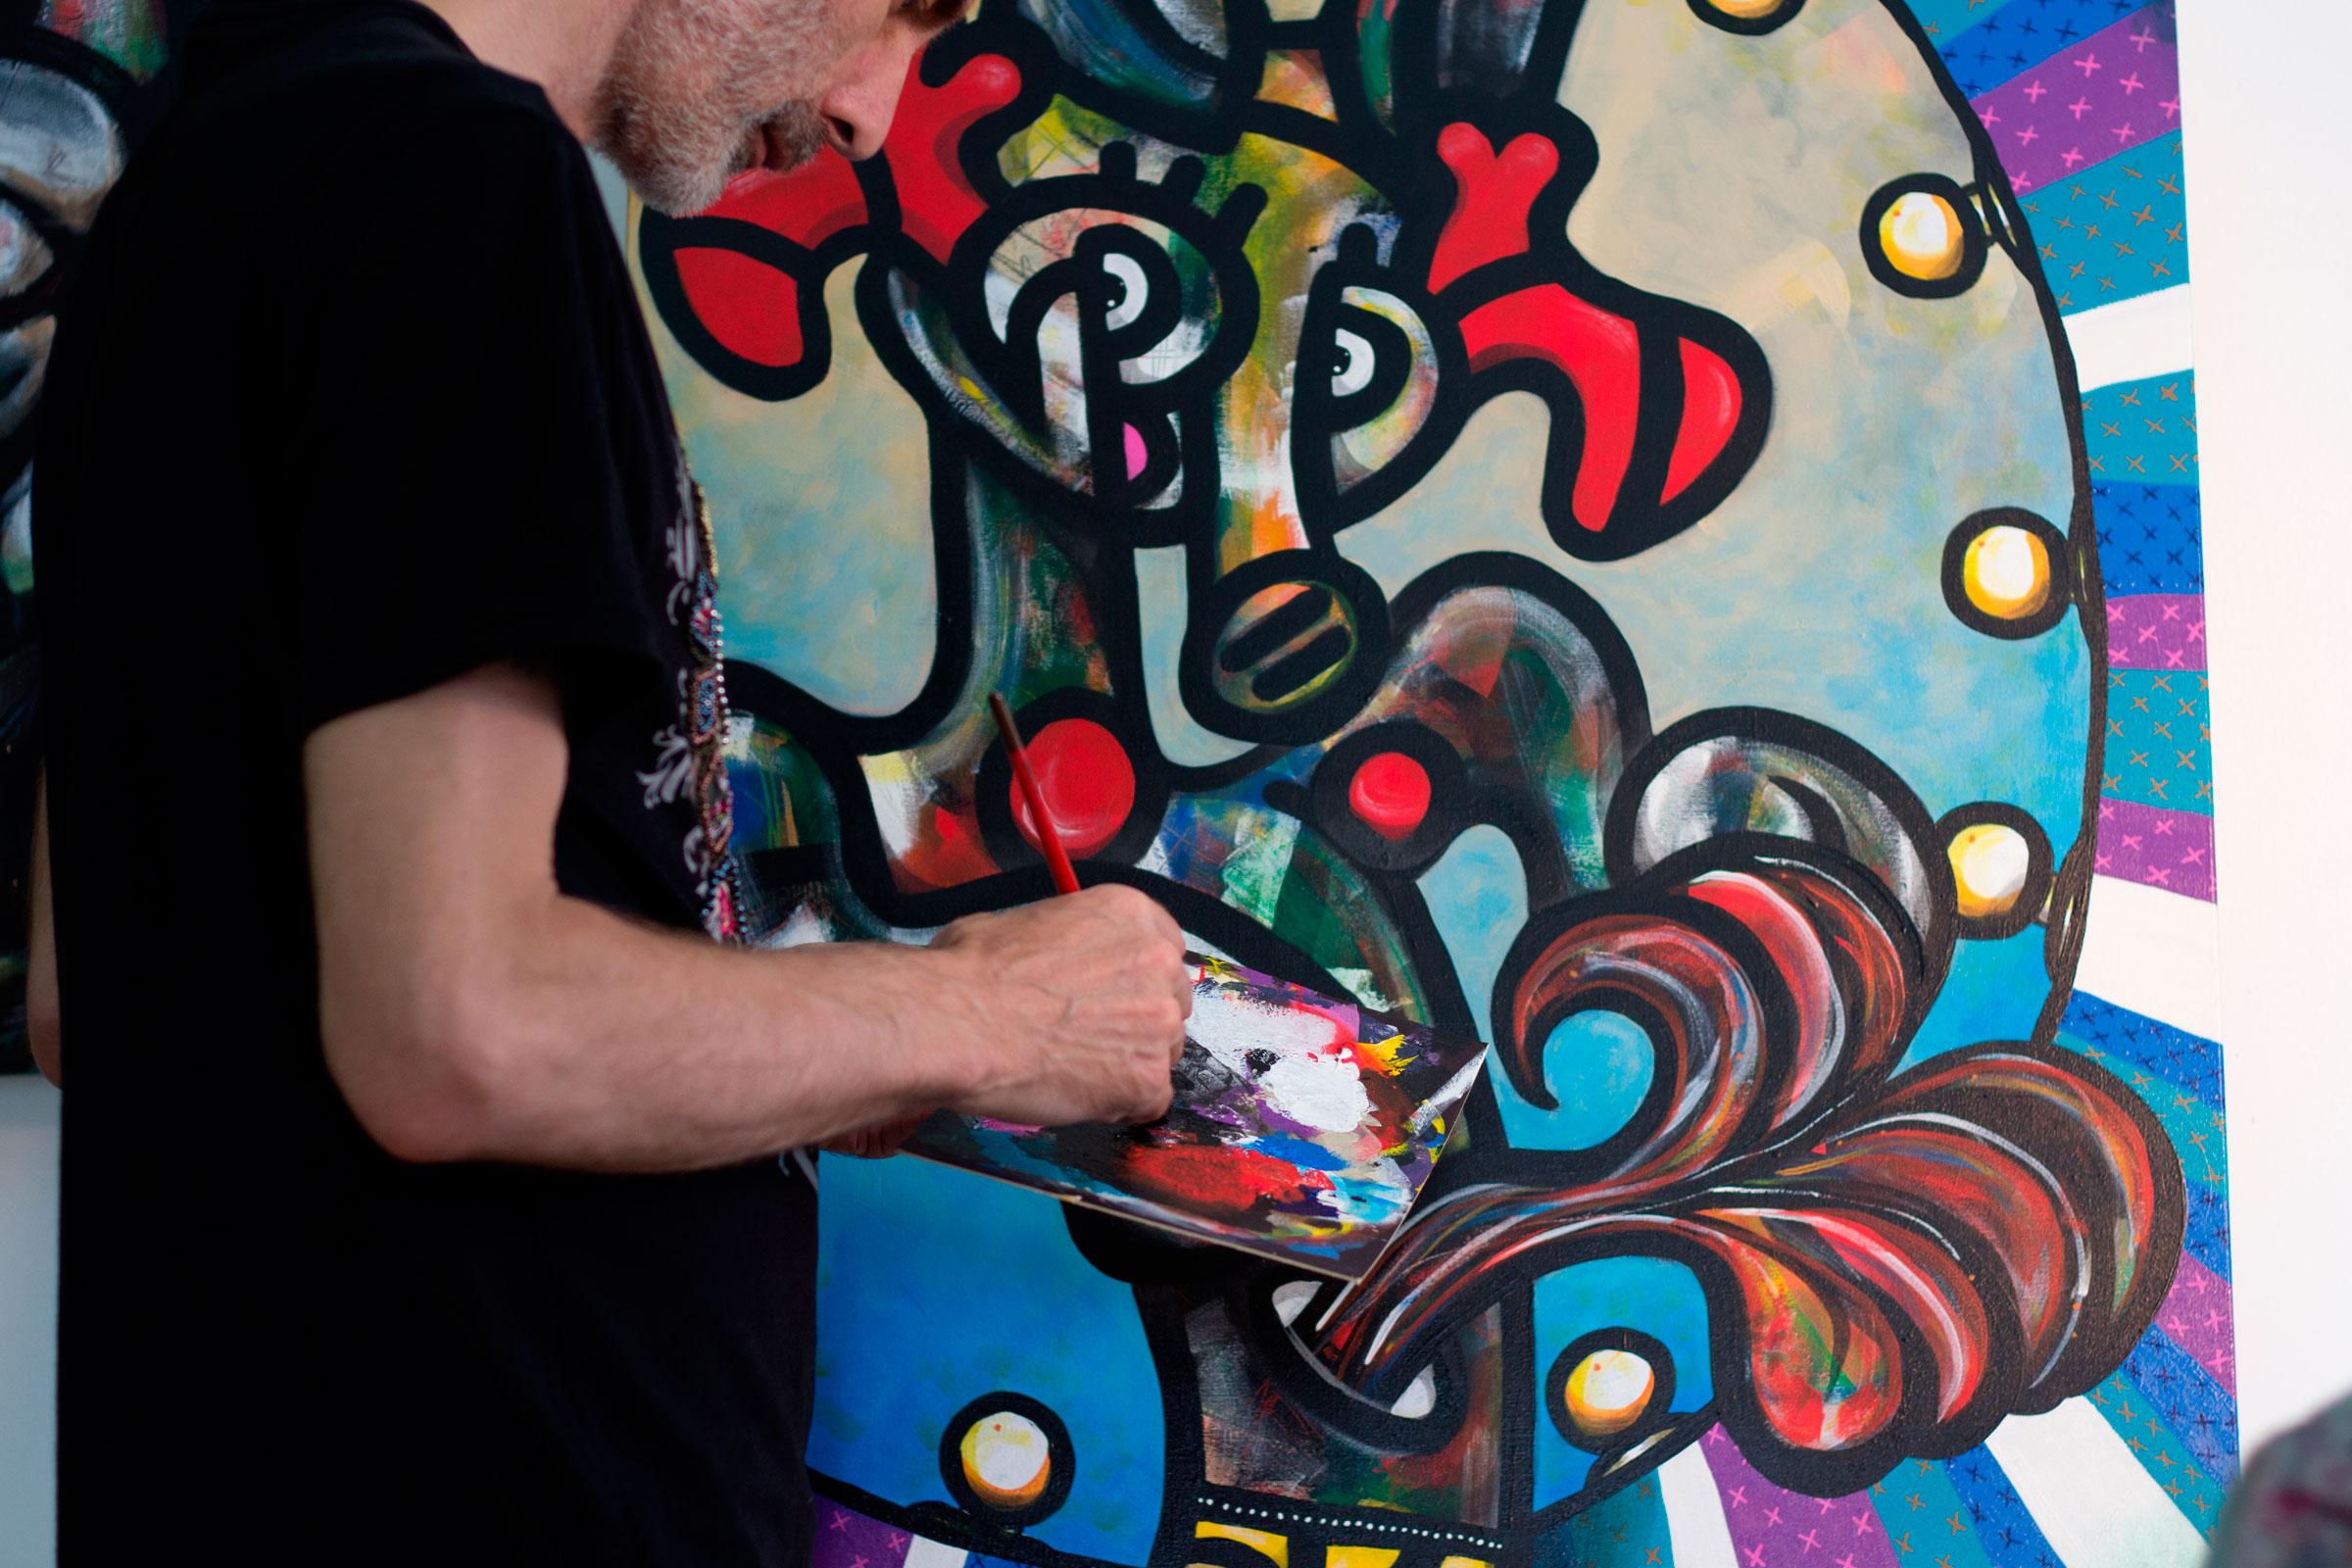 All-Studio-Sylvain-Pare-Art-11.jpg